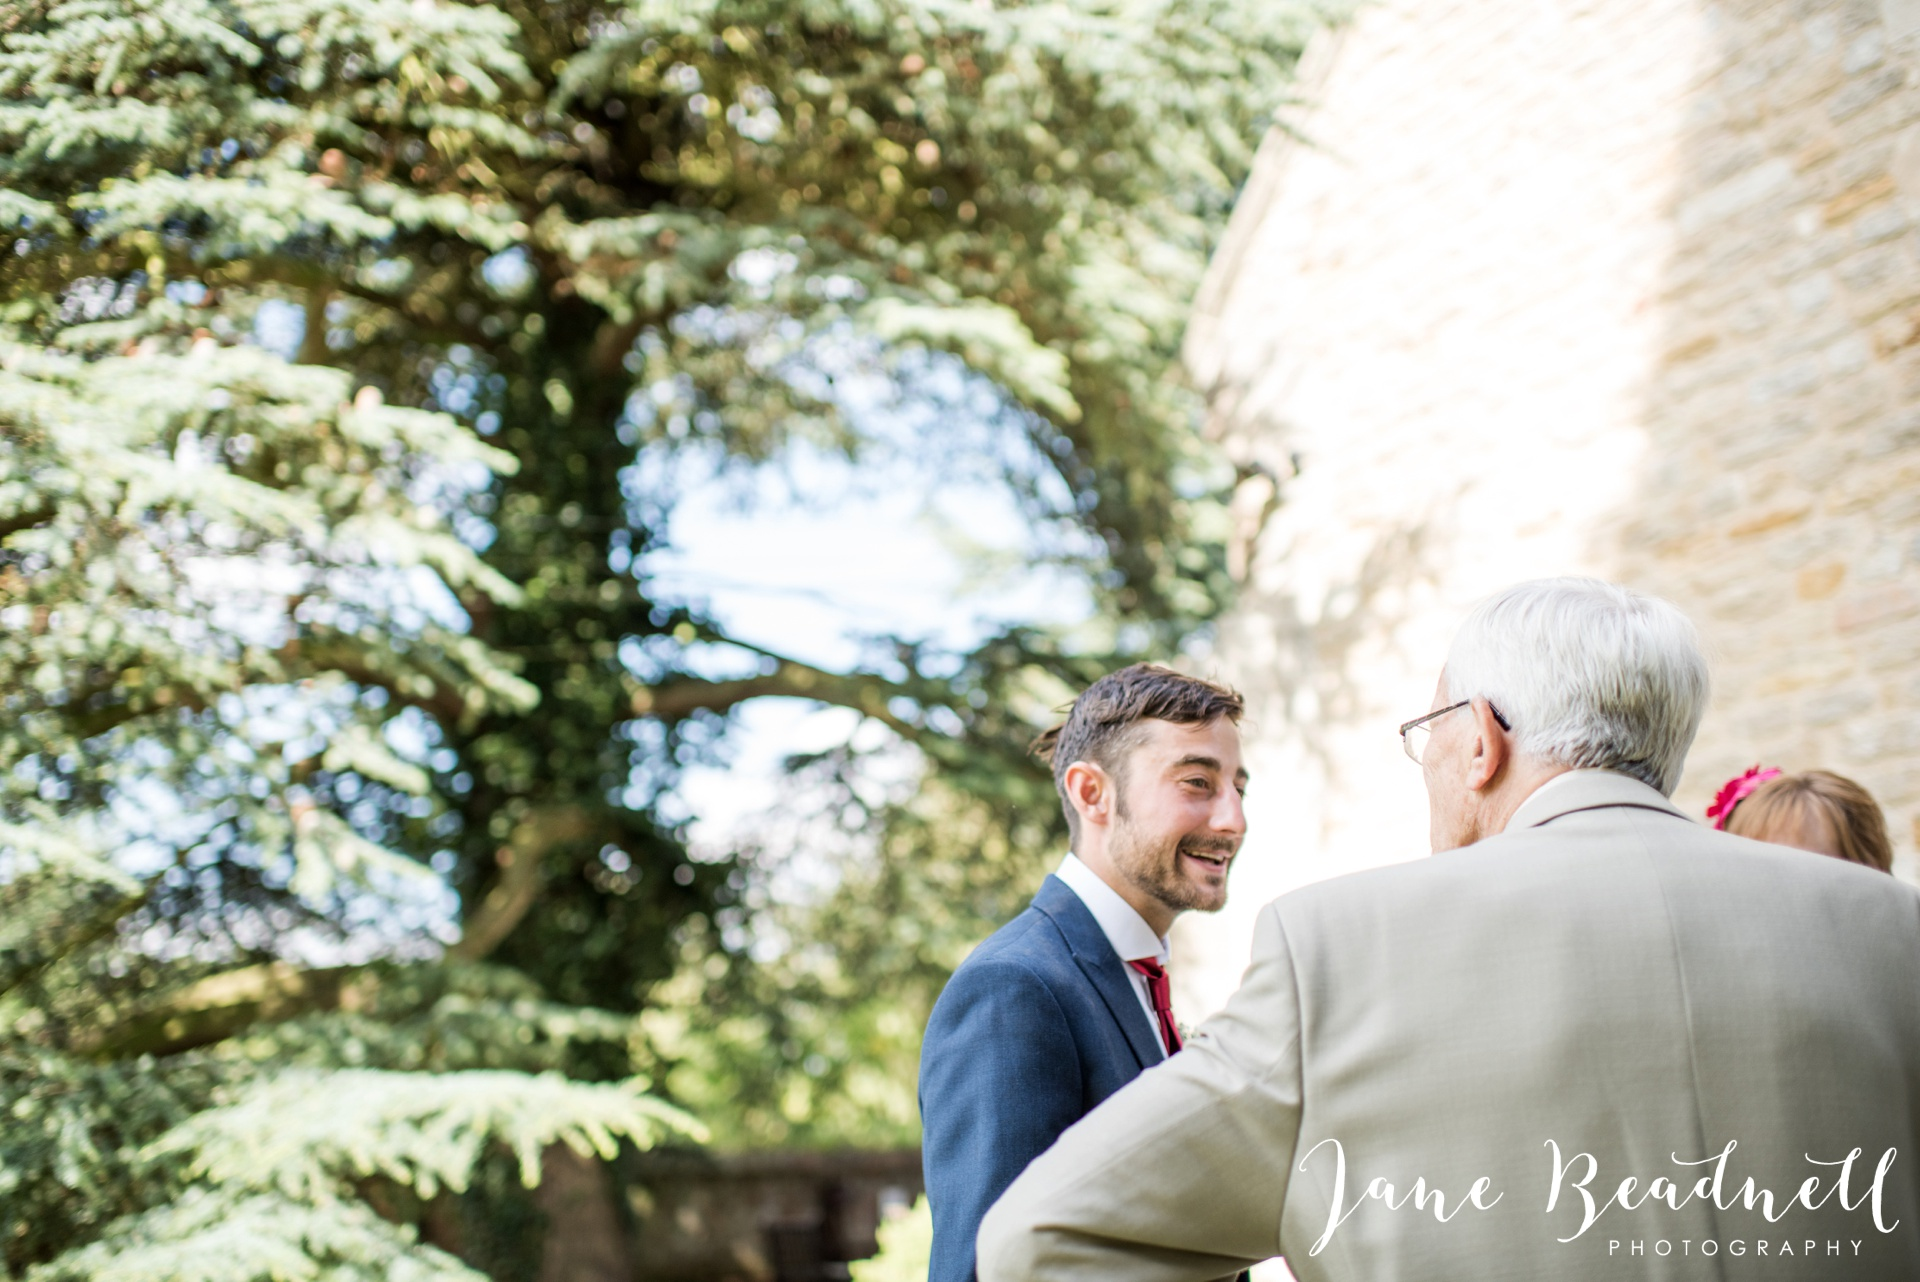 yorkshire-fine-art-wedding-photographer-jane-beadnell-photography-poppleton-york_0061